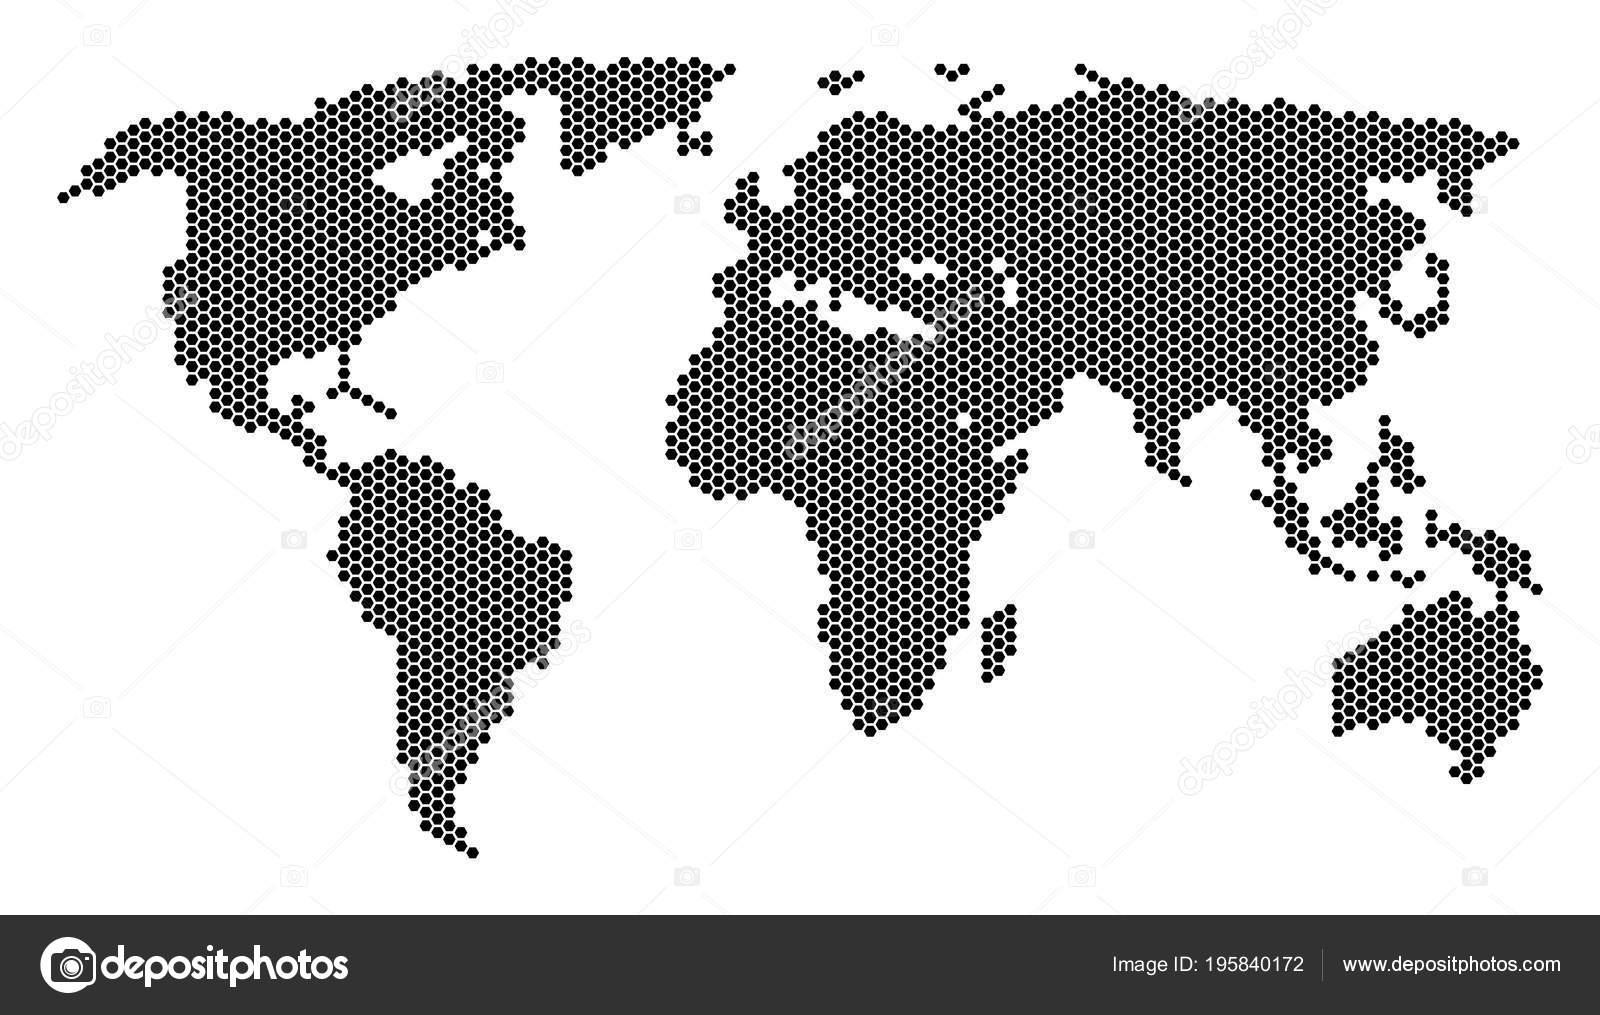 Hexagonal world map stock vector ahasoft 195840172 hexagonal world map stock vector gumiabroncs Gallery